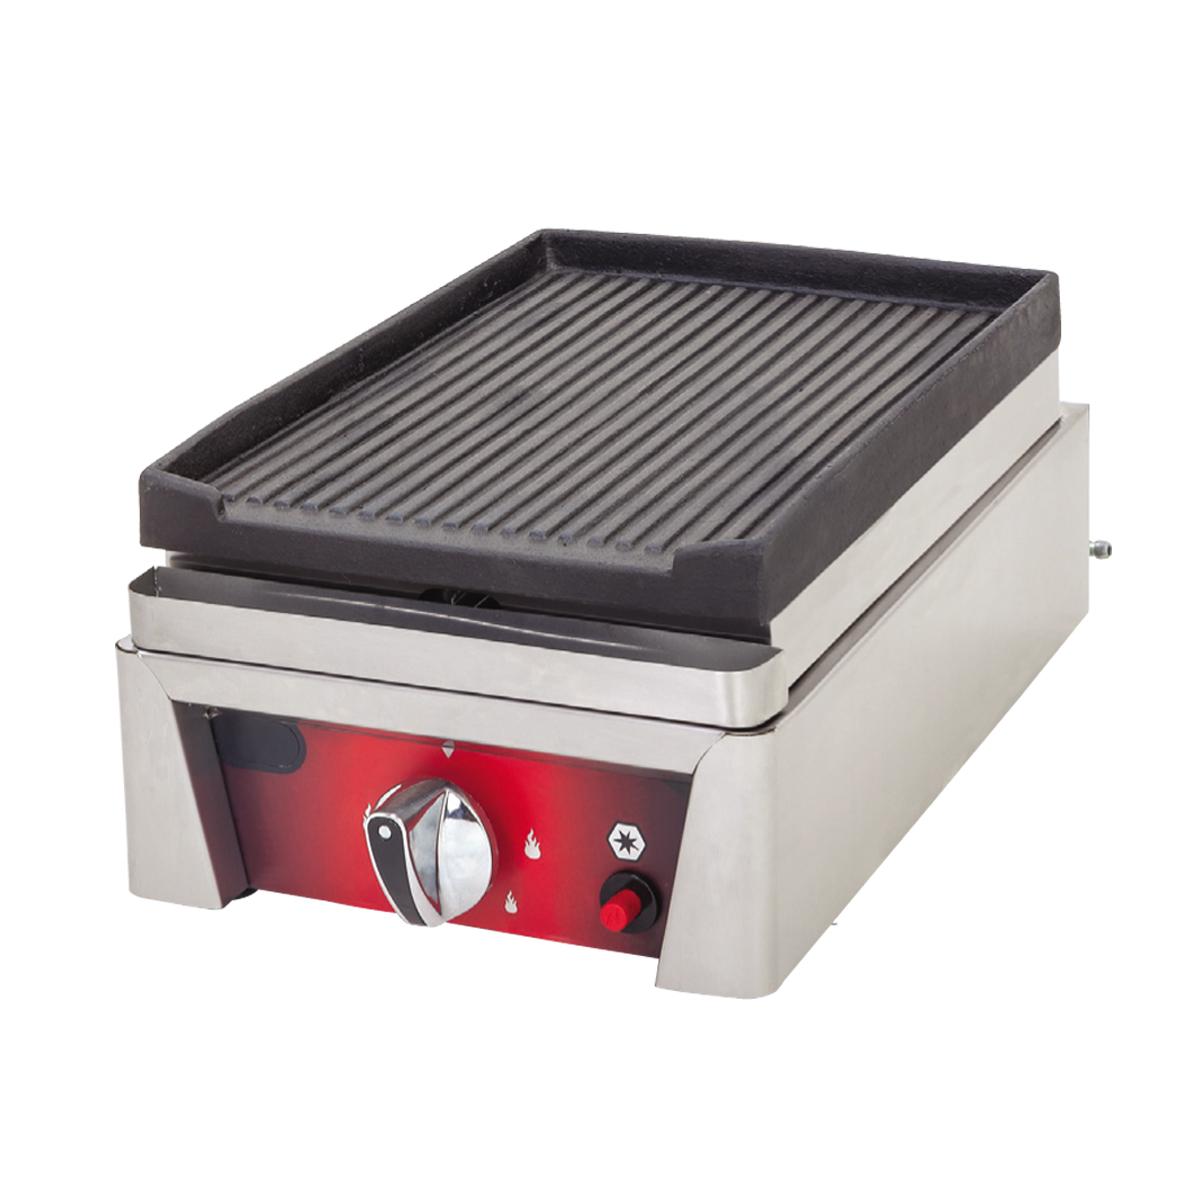 Cast Iron Grill Plus - 30cm - Gas